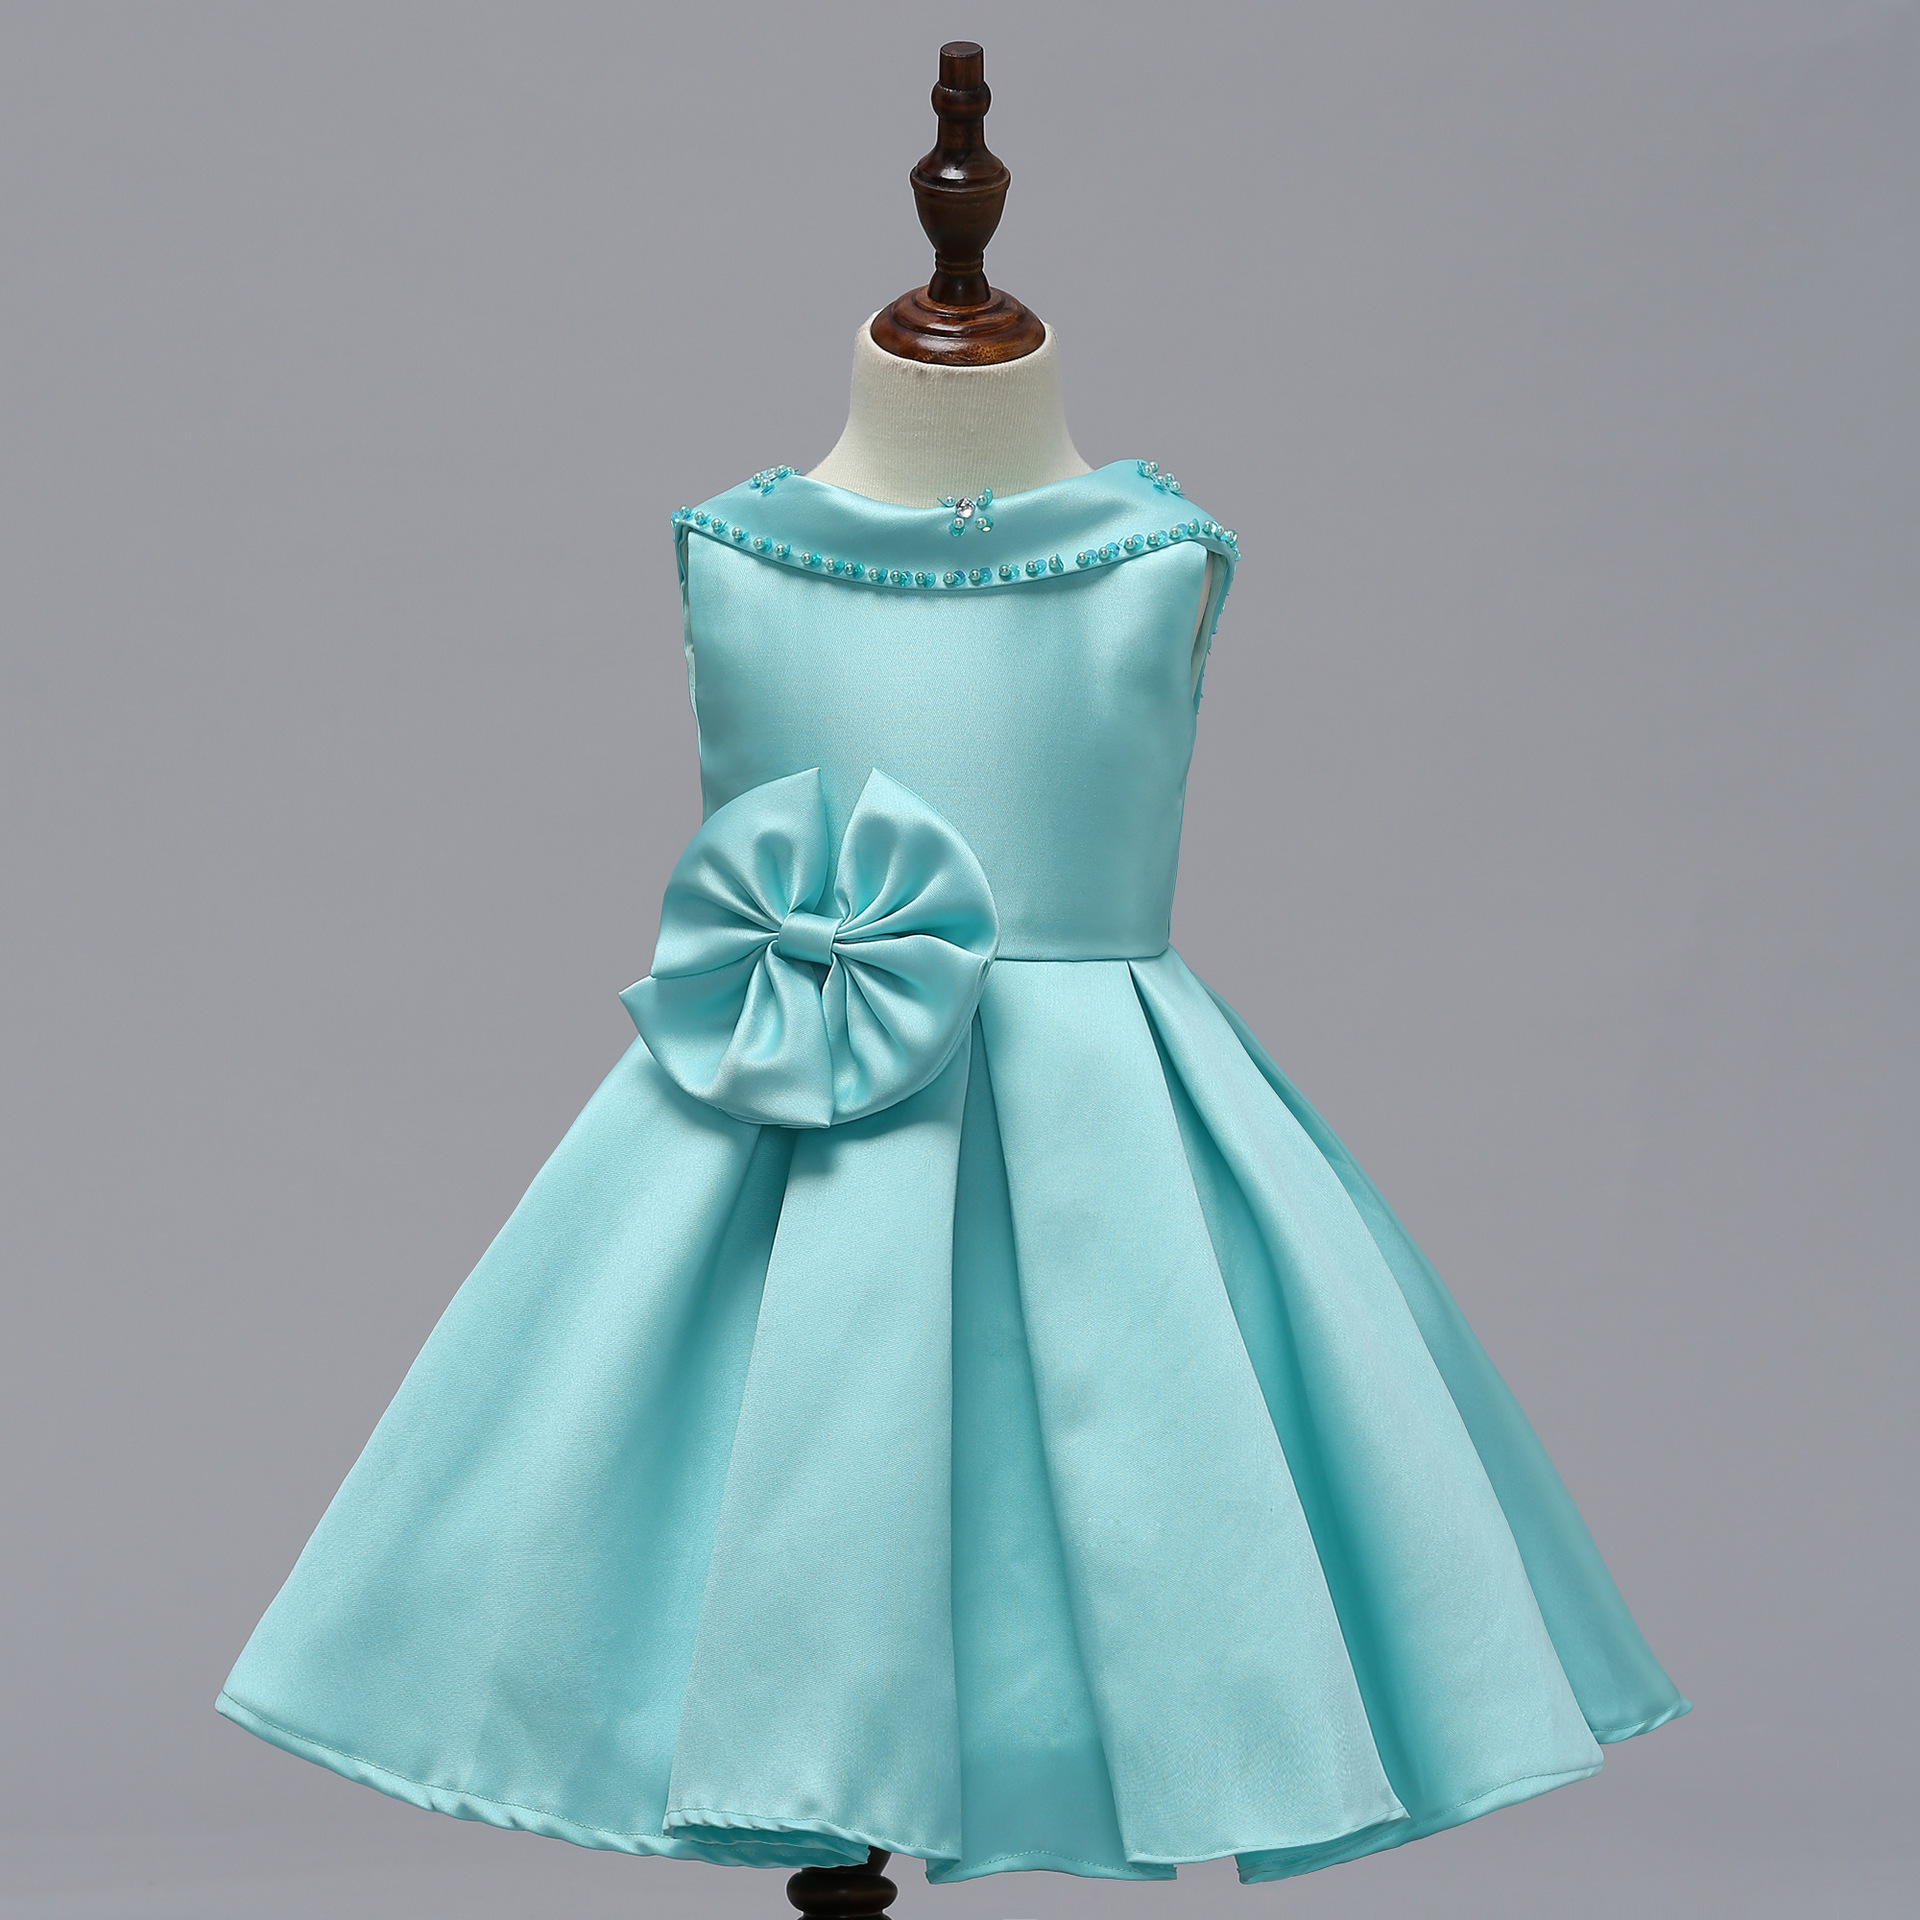 6483991dad27 Girl Princess Dress Kids Dresses for Girls Party Dresses Summer ...